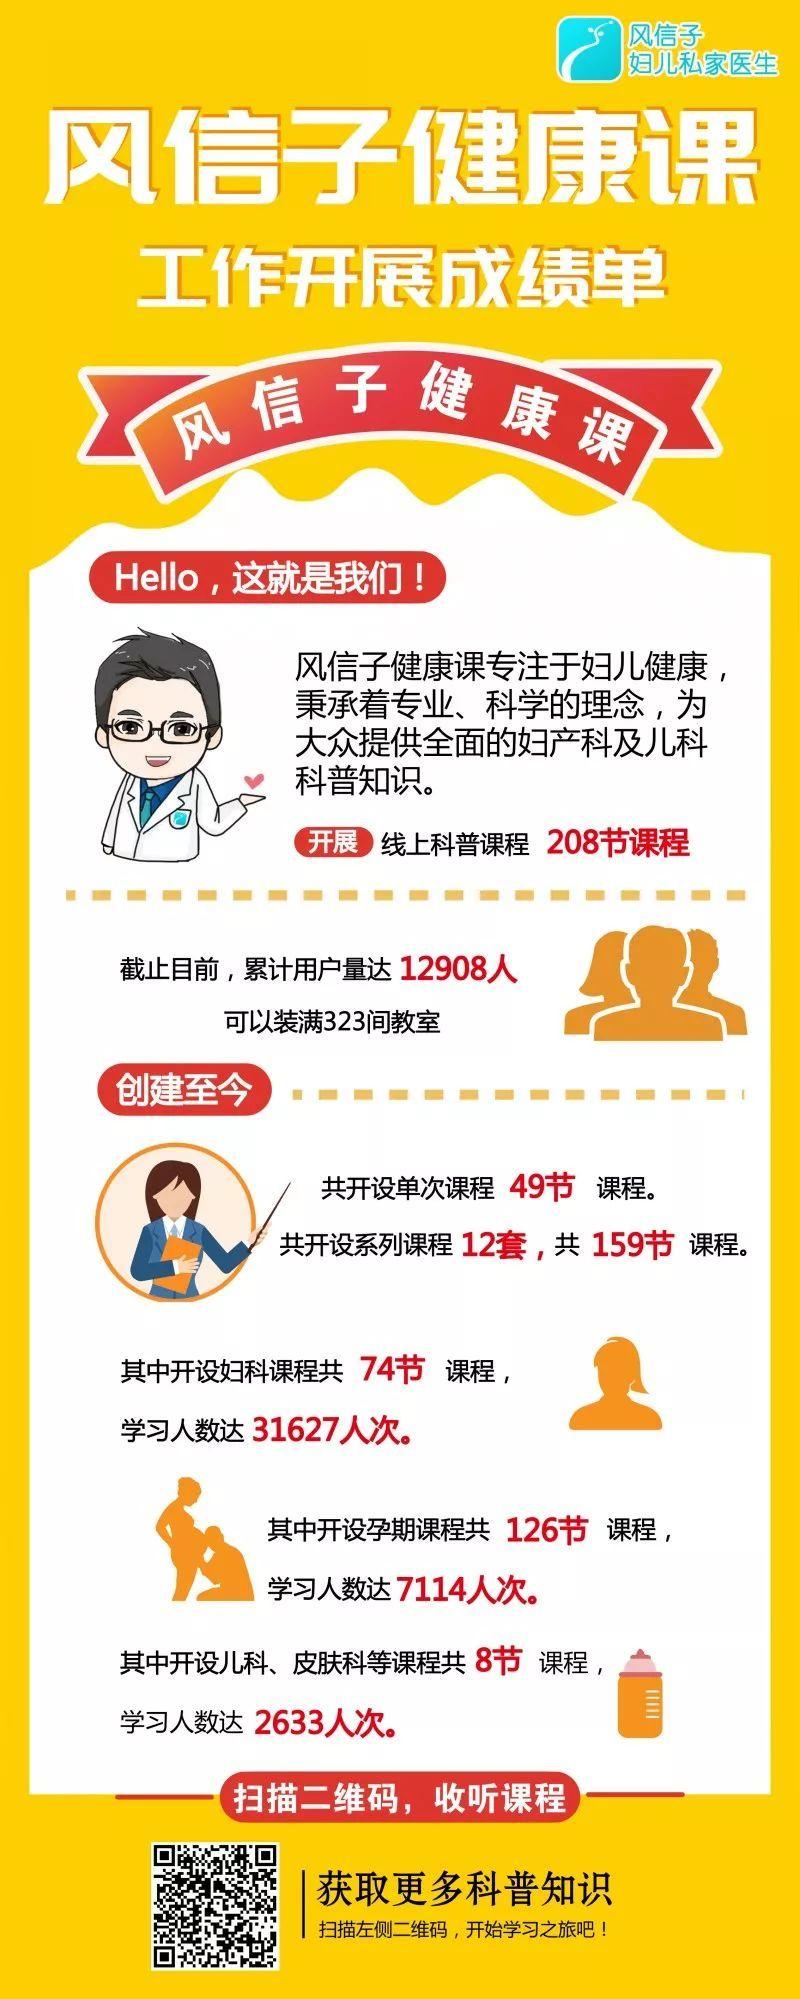 18bet中文网站登录 6